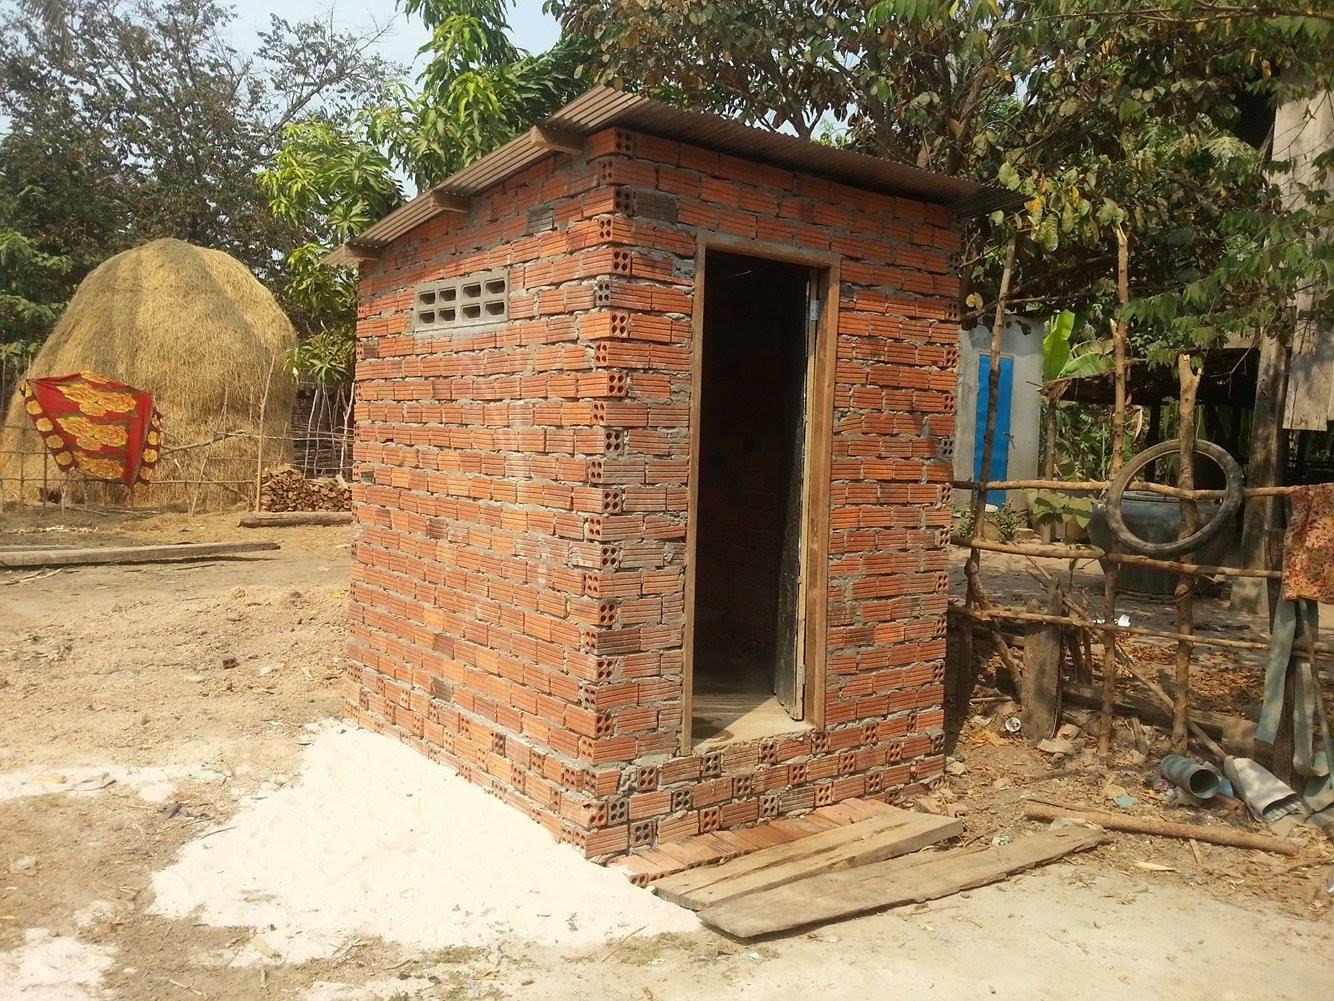 Drie openbare toiletten gerealiseerd